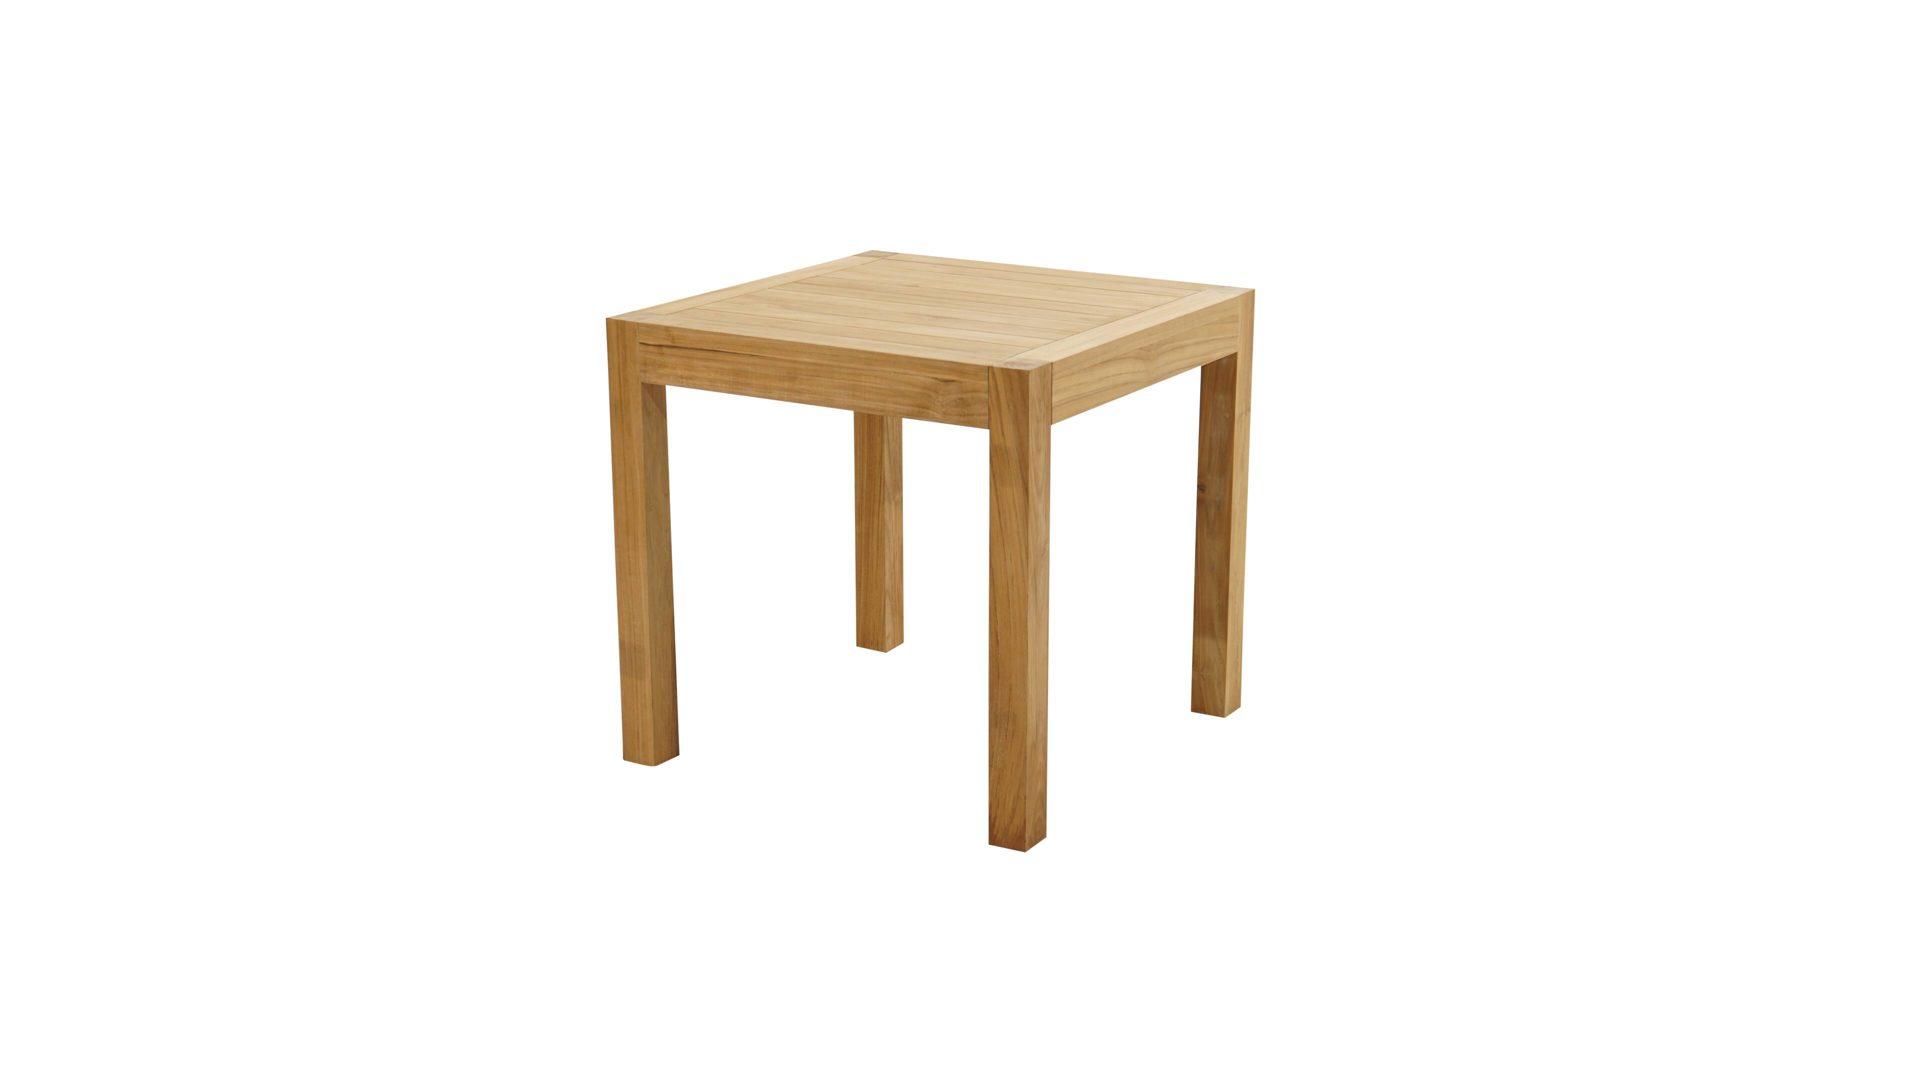 Ploss Loft Tisch New Haven Als Gartenmobel Teakholz Ca 80 X 80 Cm